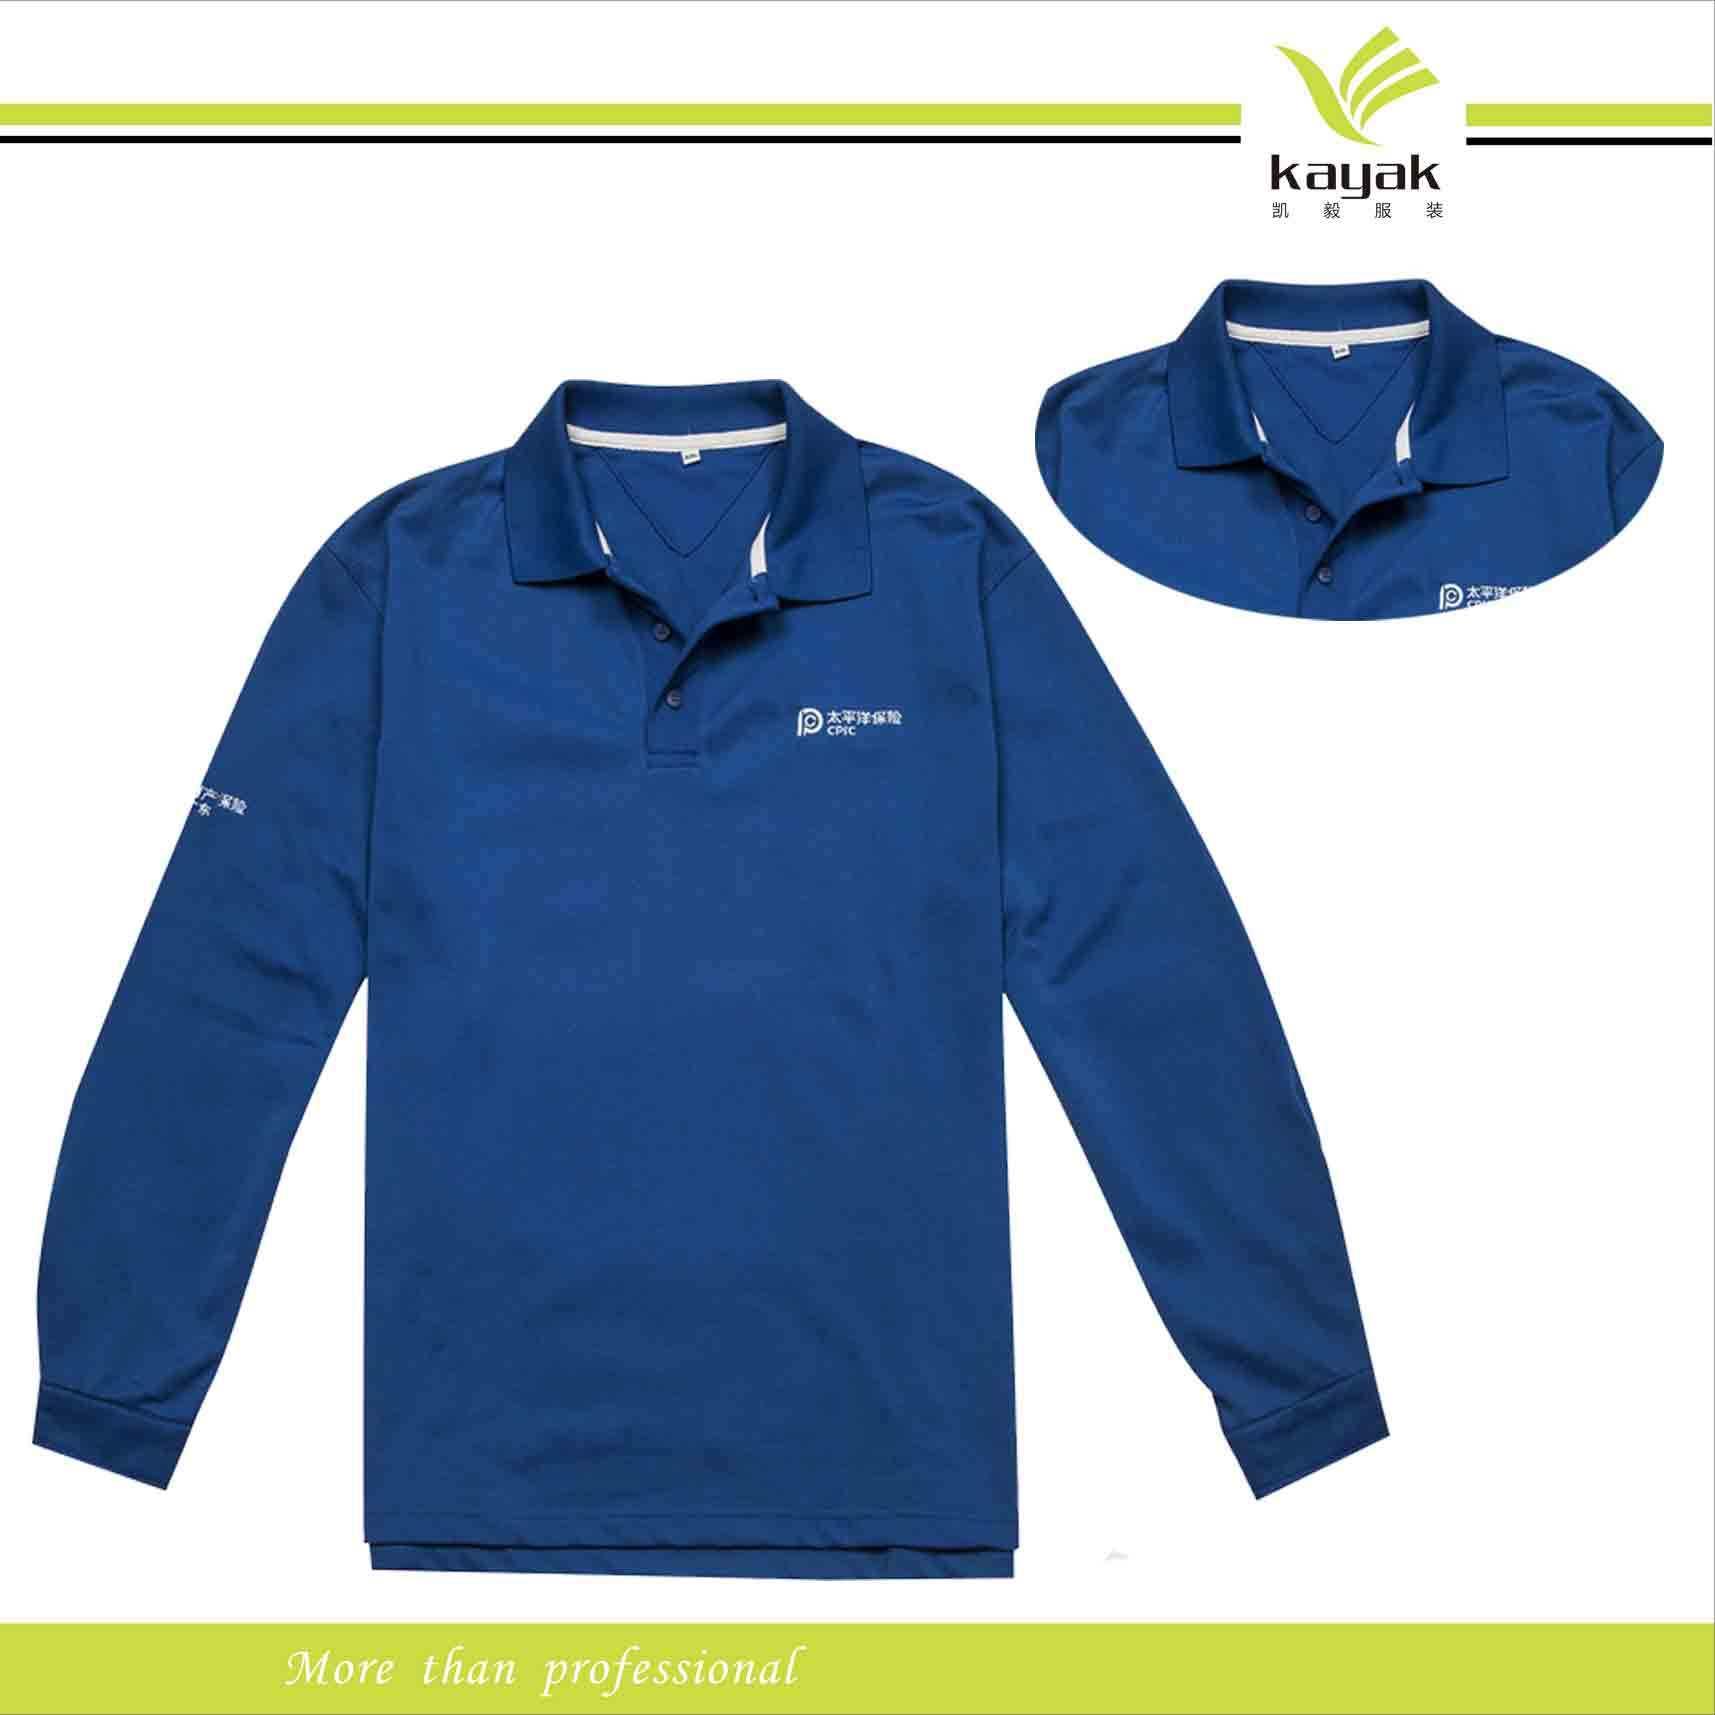 China custom high quality embroidery long sleeve polo for High quality embroidered polo shirts